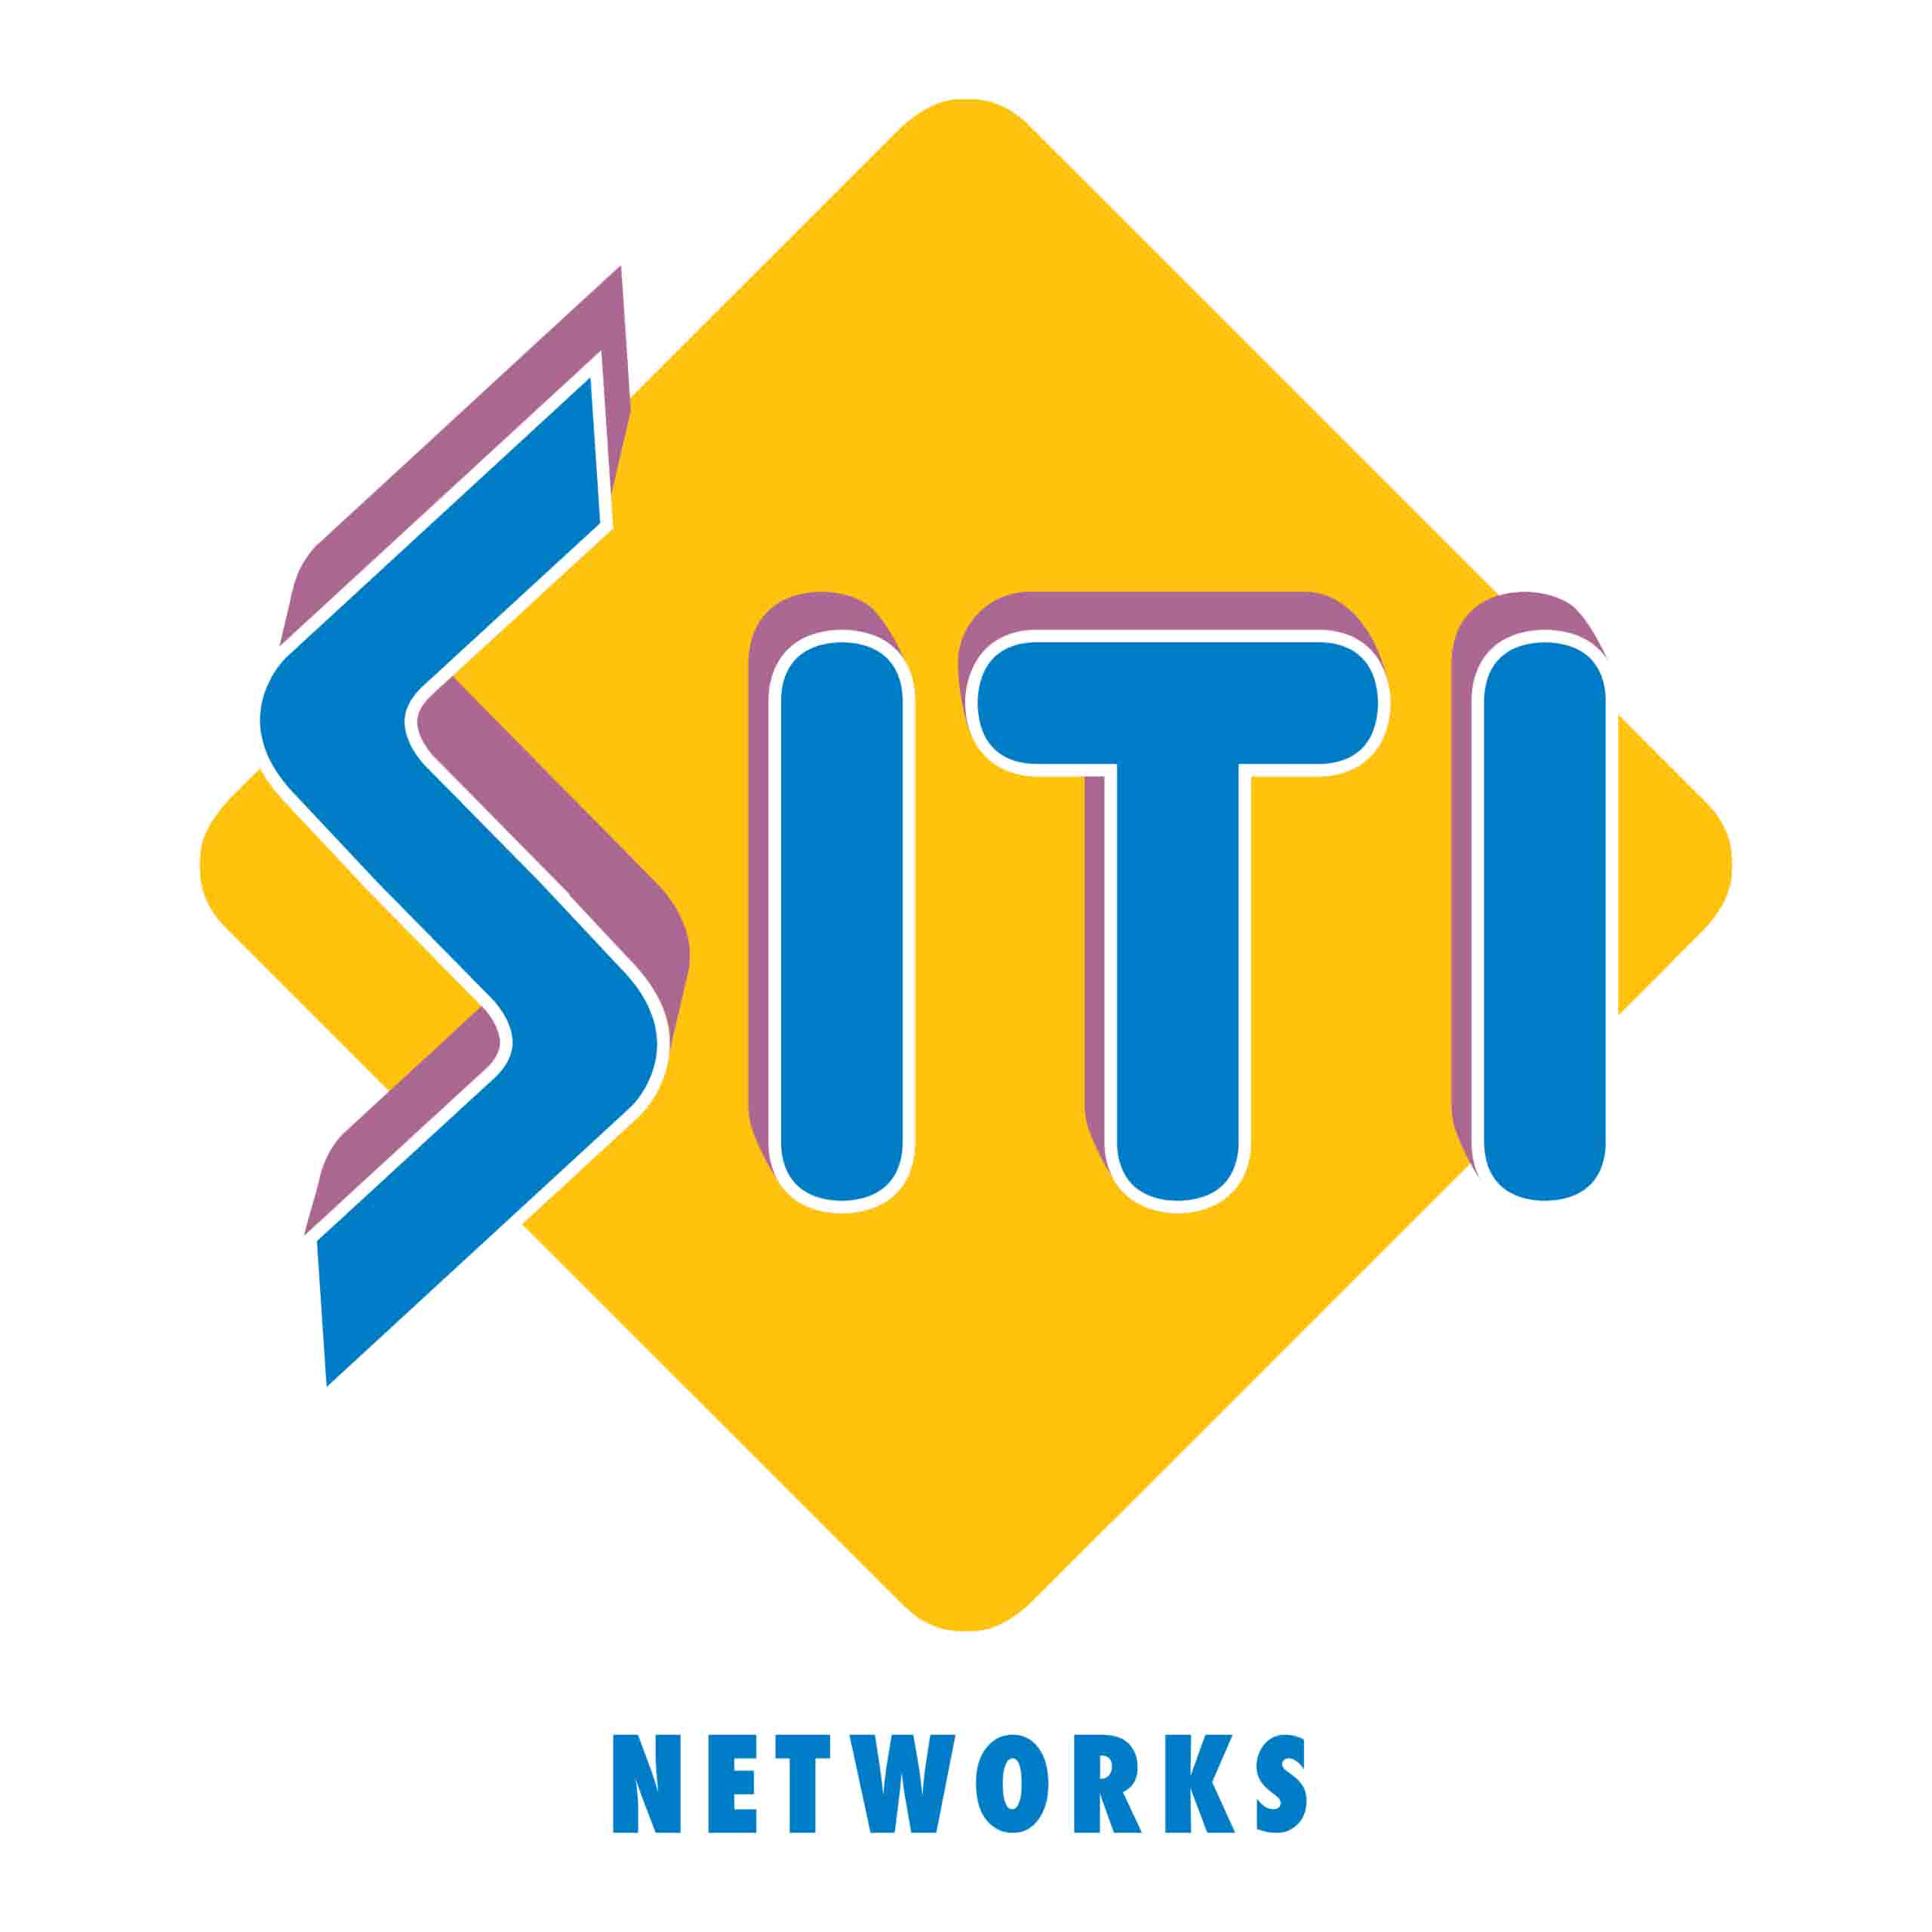 Siti Network Logo